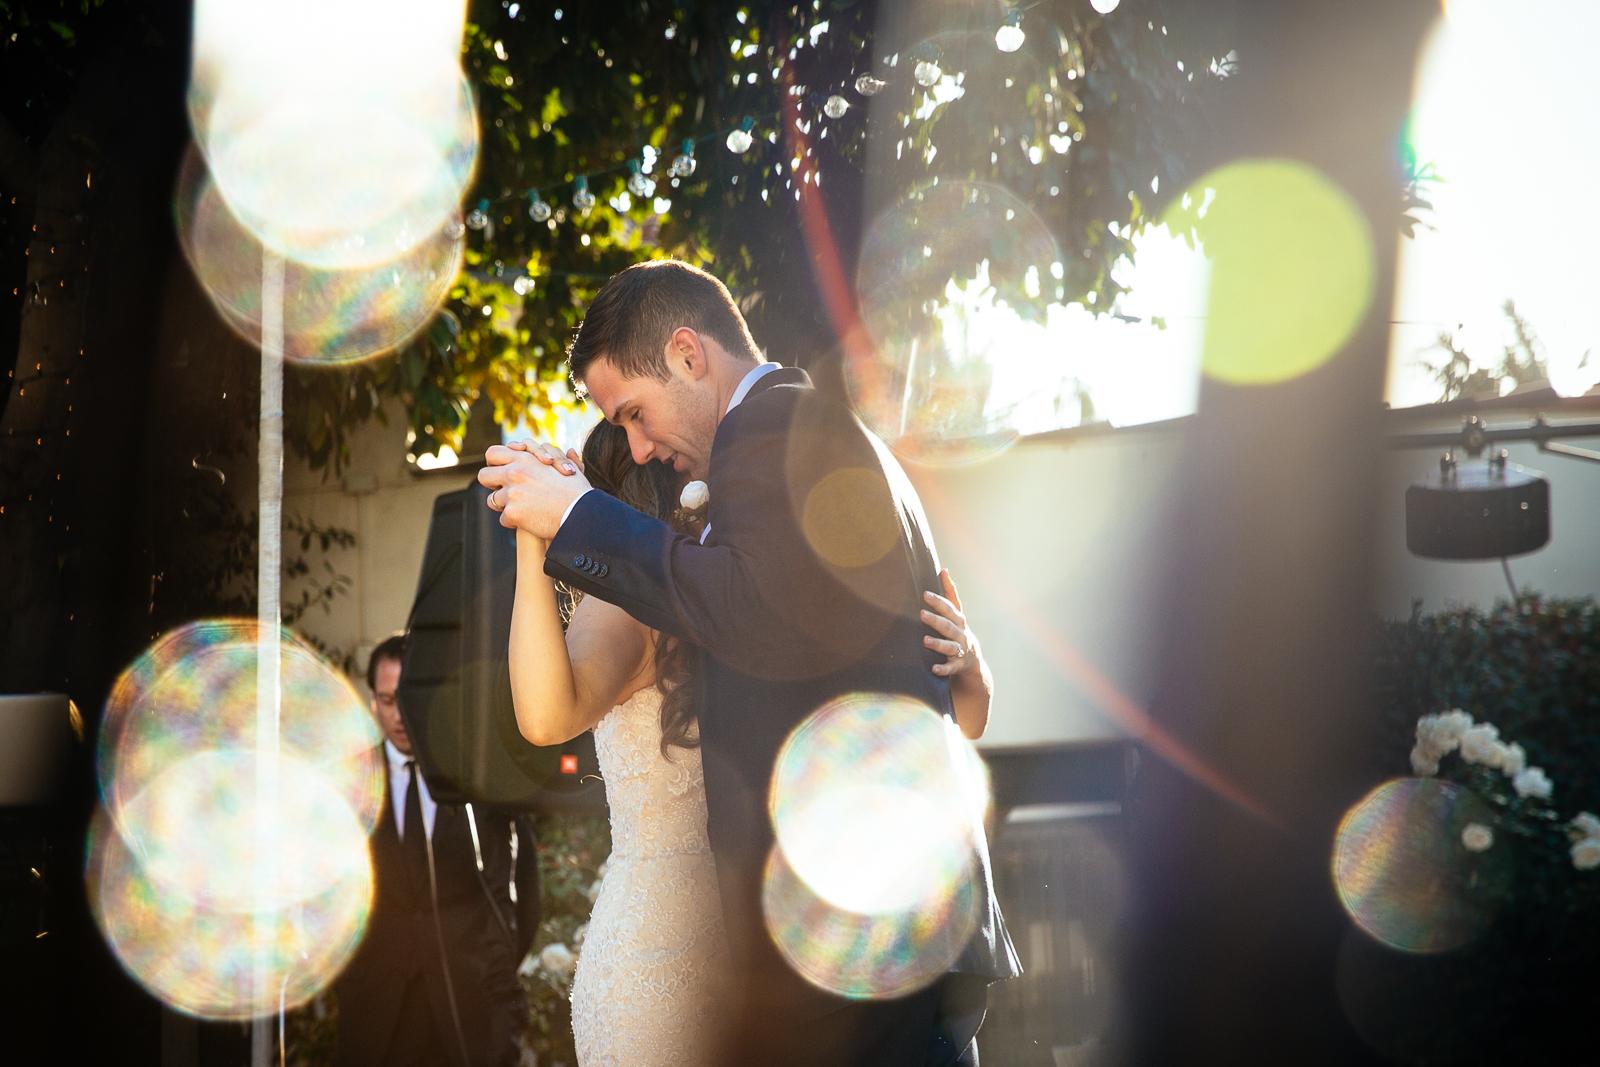 Amanda_&_Steve_Wedding_Darlington_House_La_Jolla_2015_IMG_7027.JPG